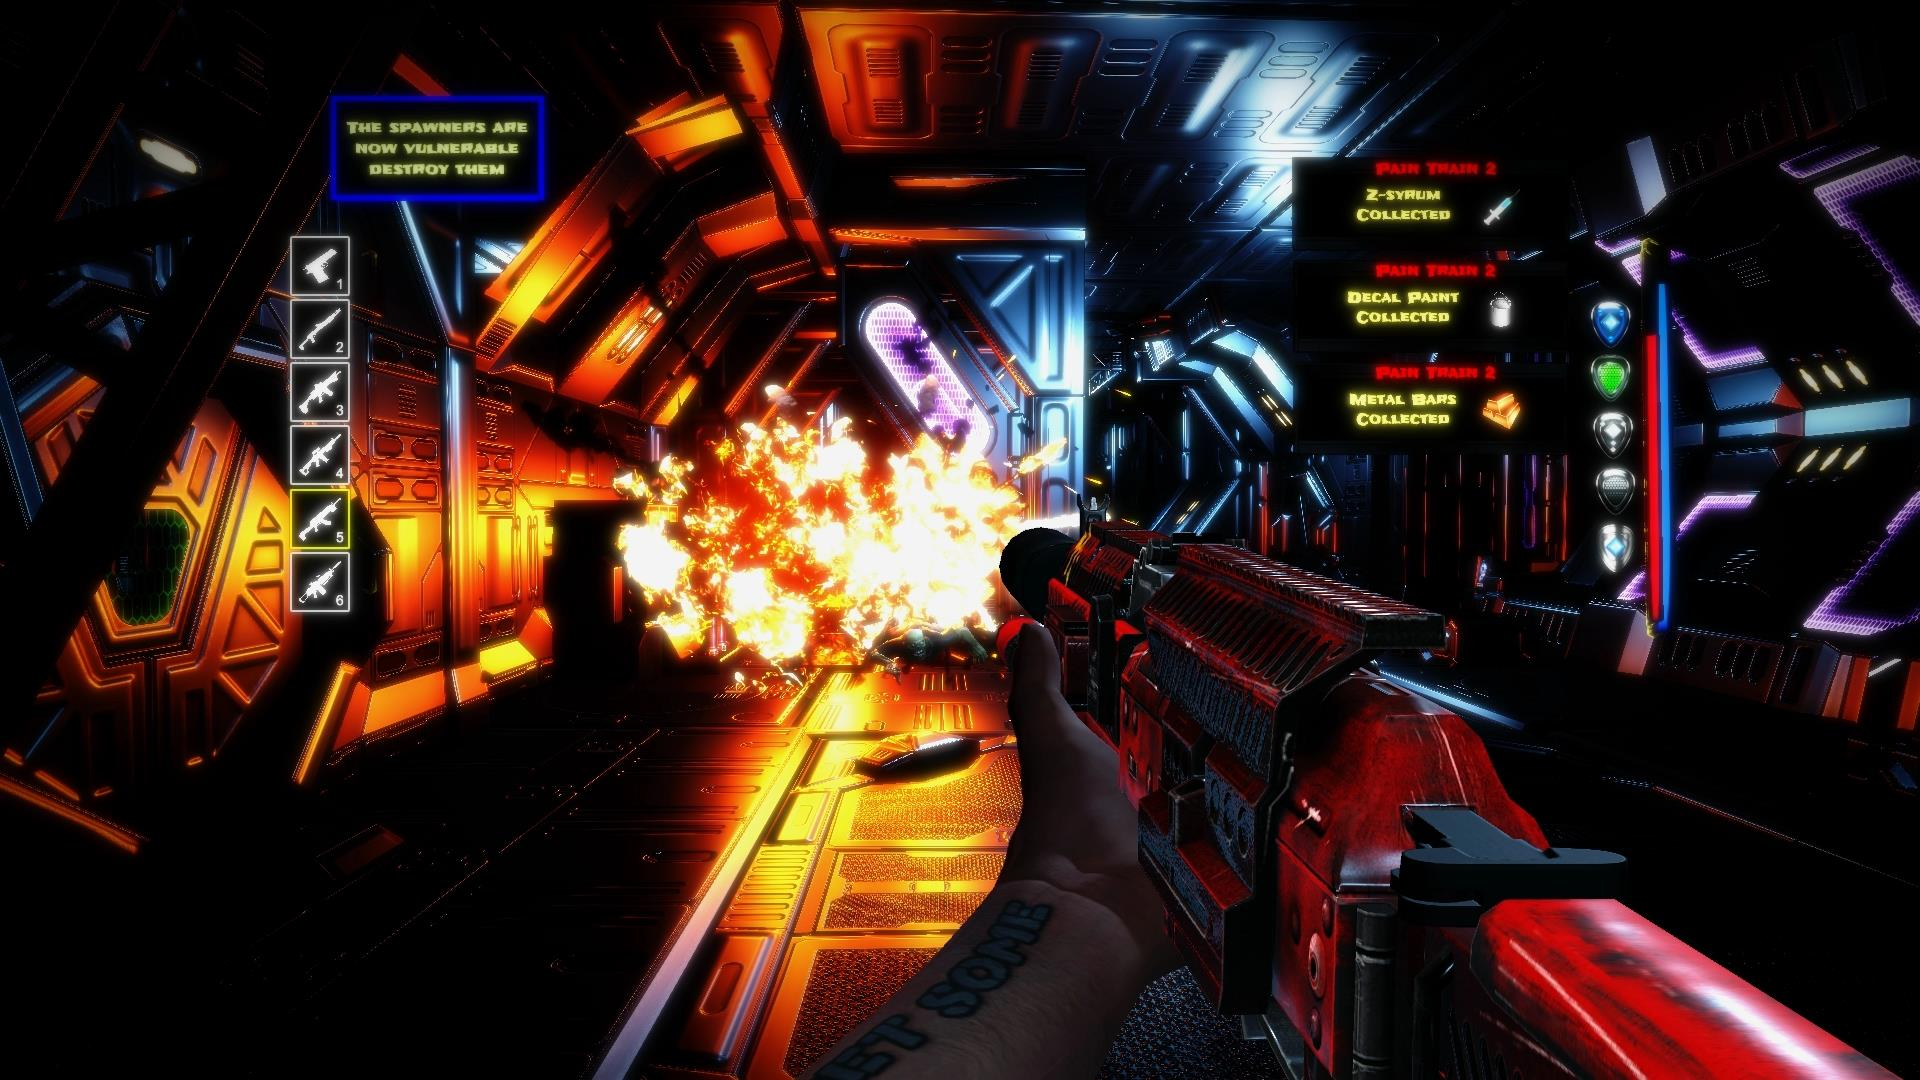 Pain Train 2 screenshot